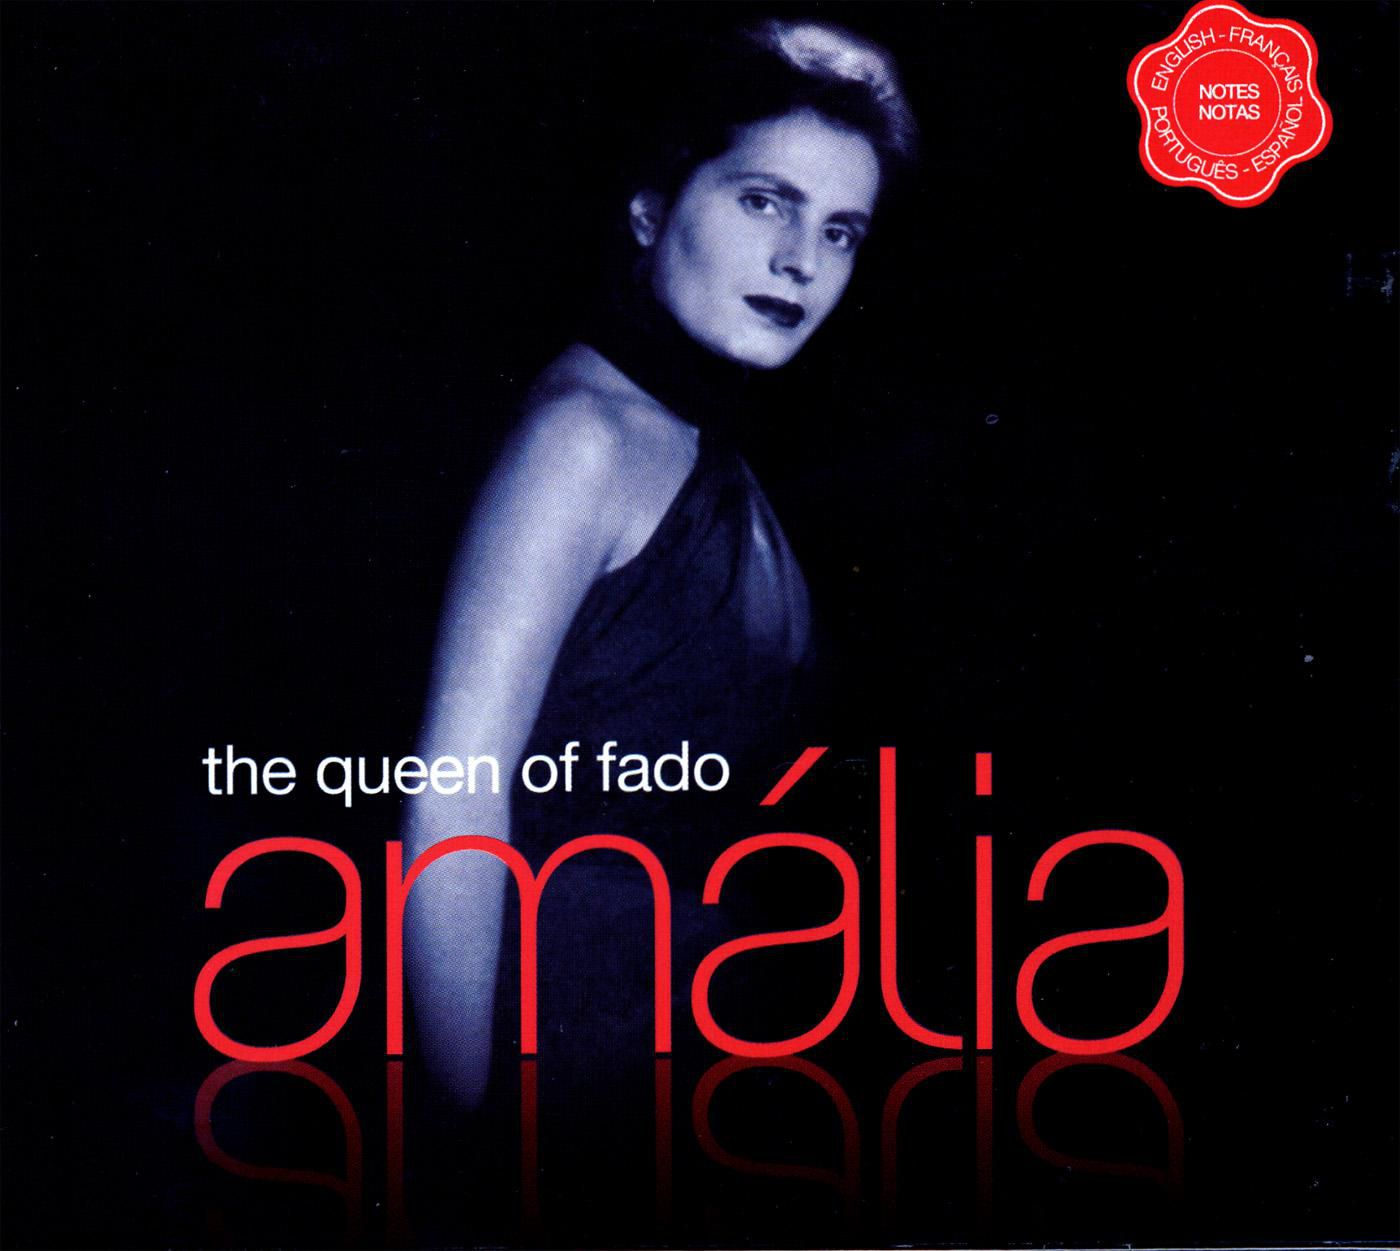 Amalia Rodrigues - 'The Queen of Fado'